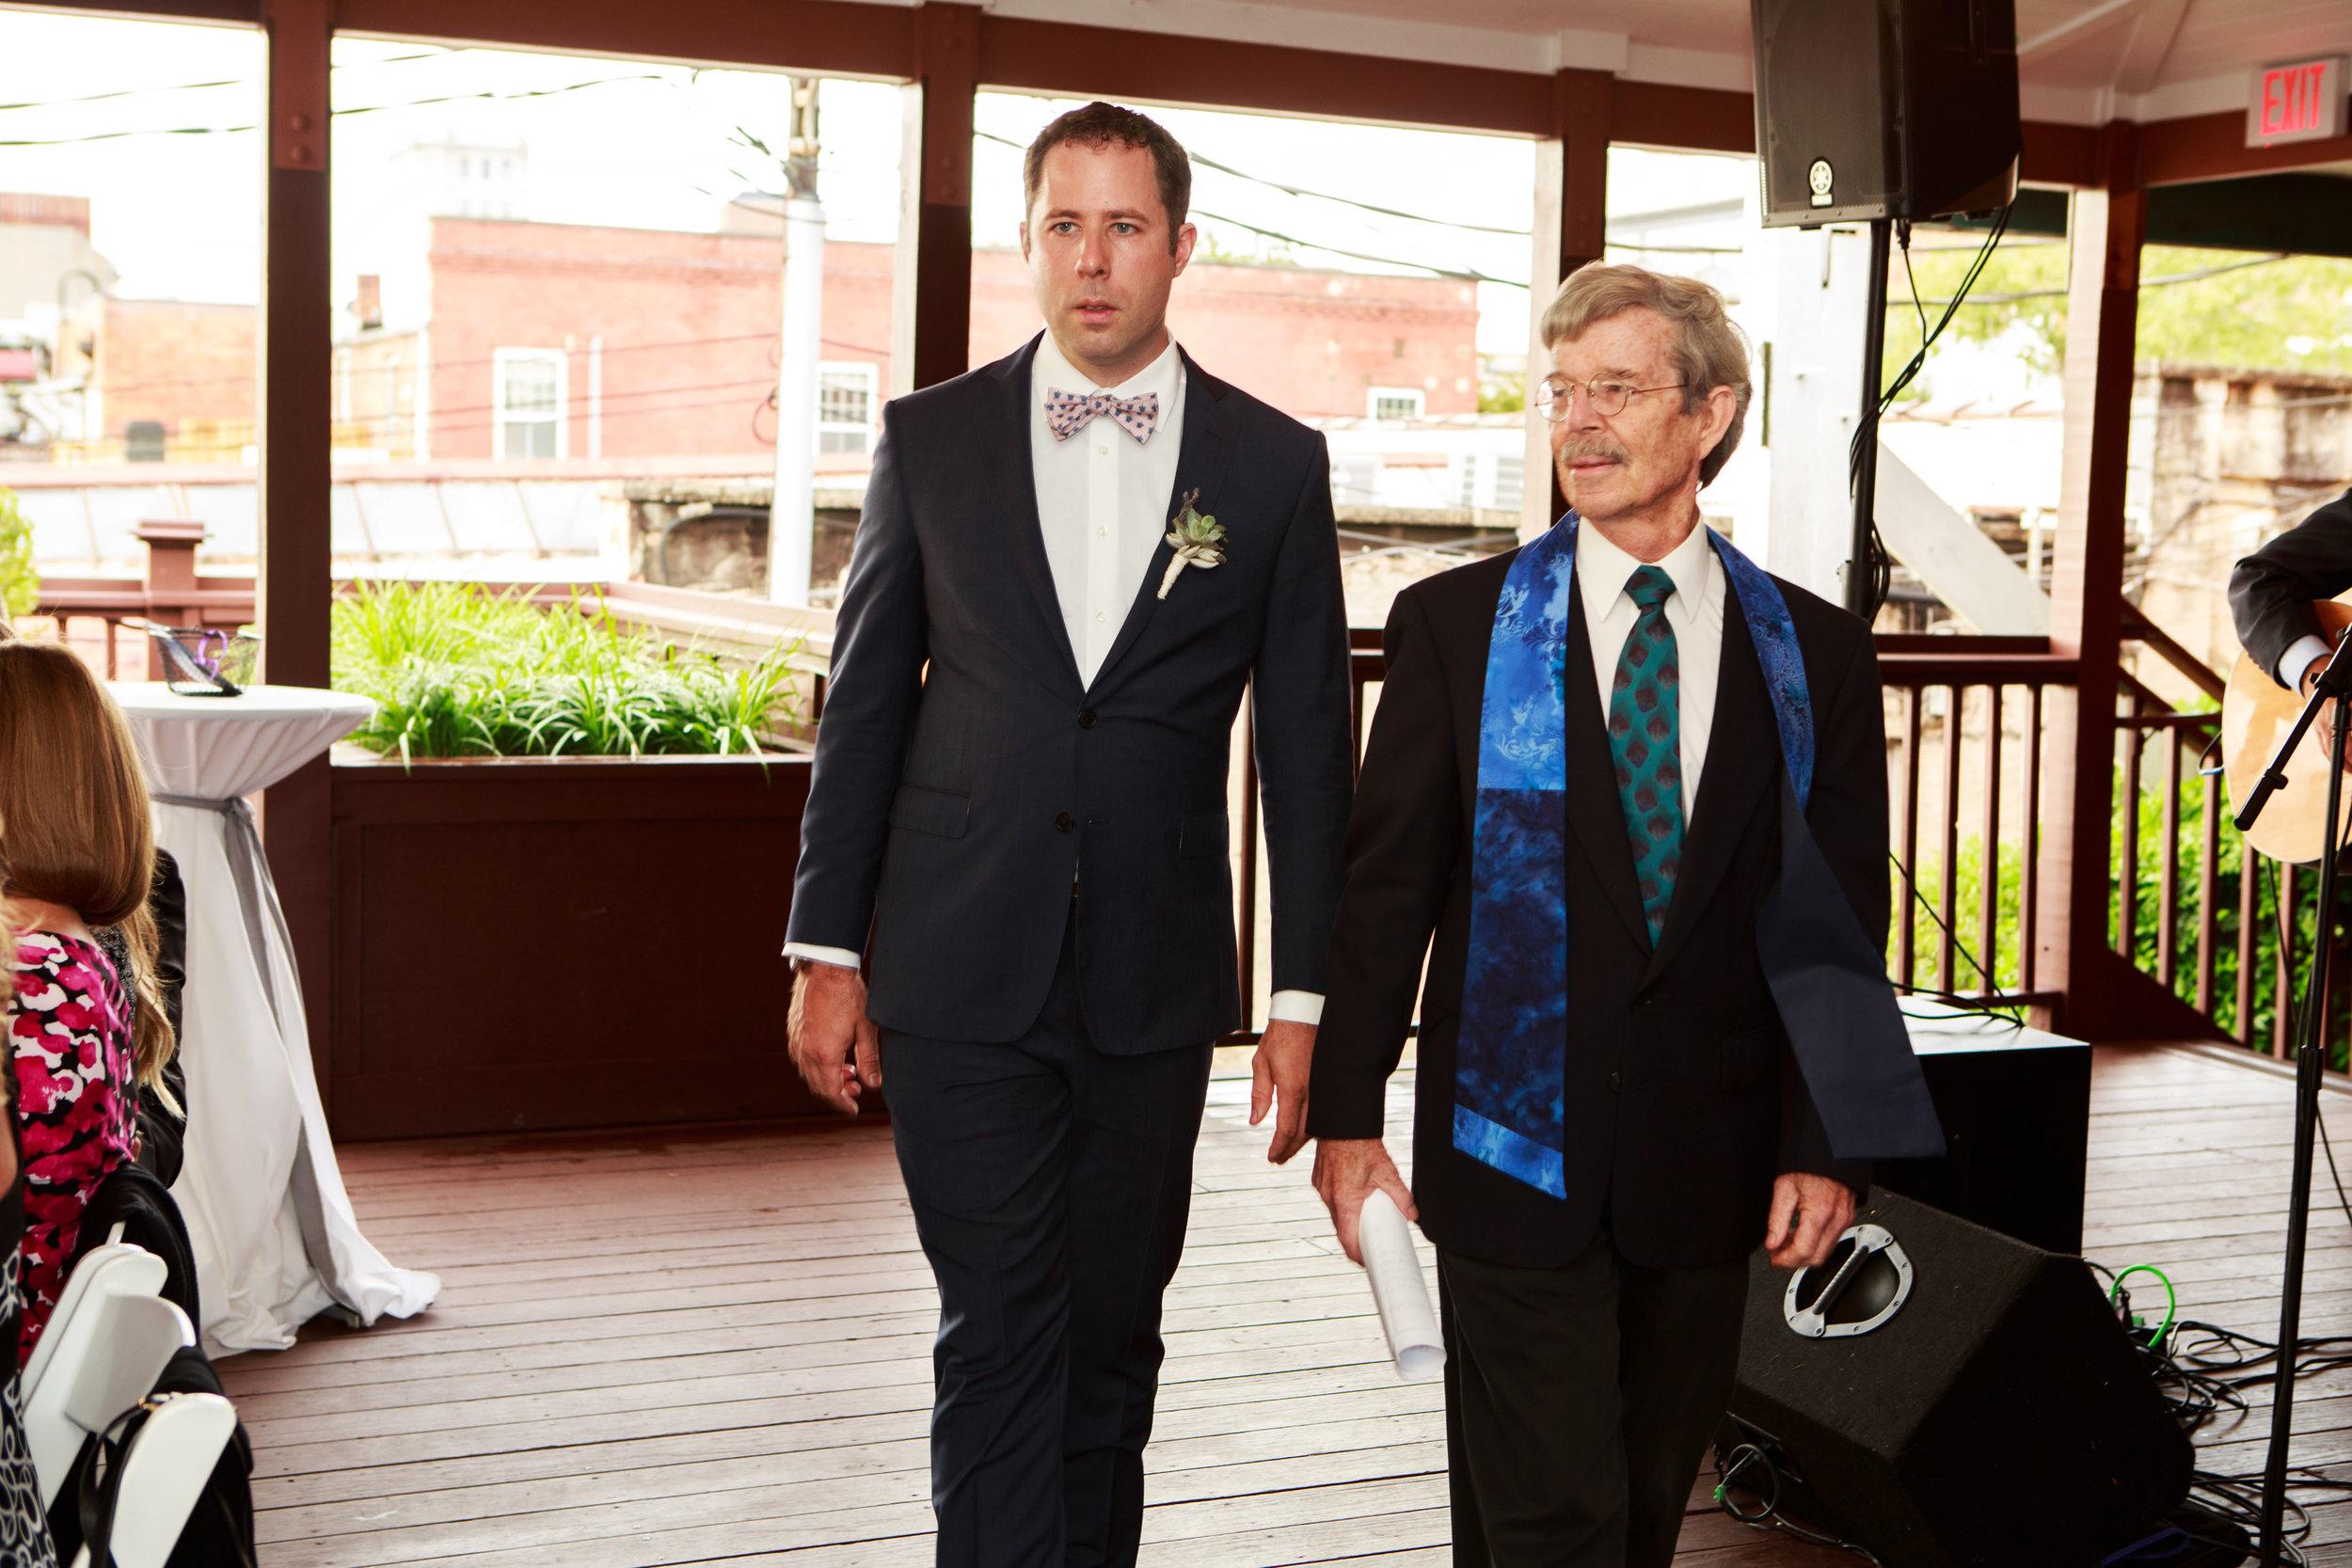 128-South-Wedding-Wilmington-NC-Photographer-Ceremony-05.jpg